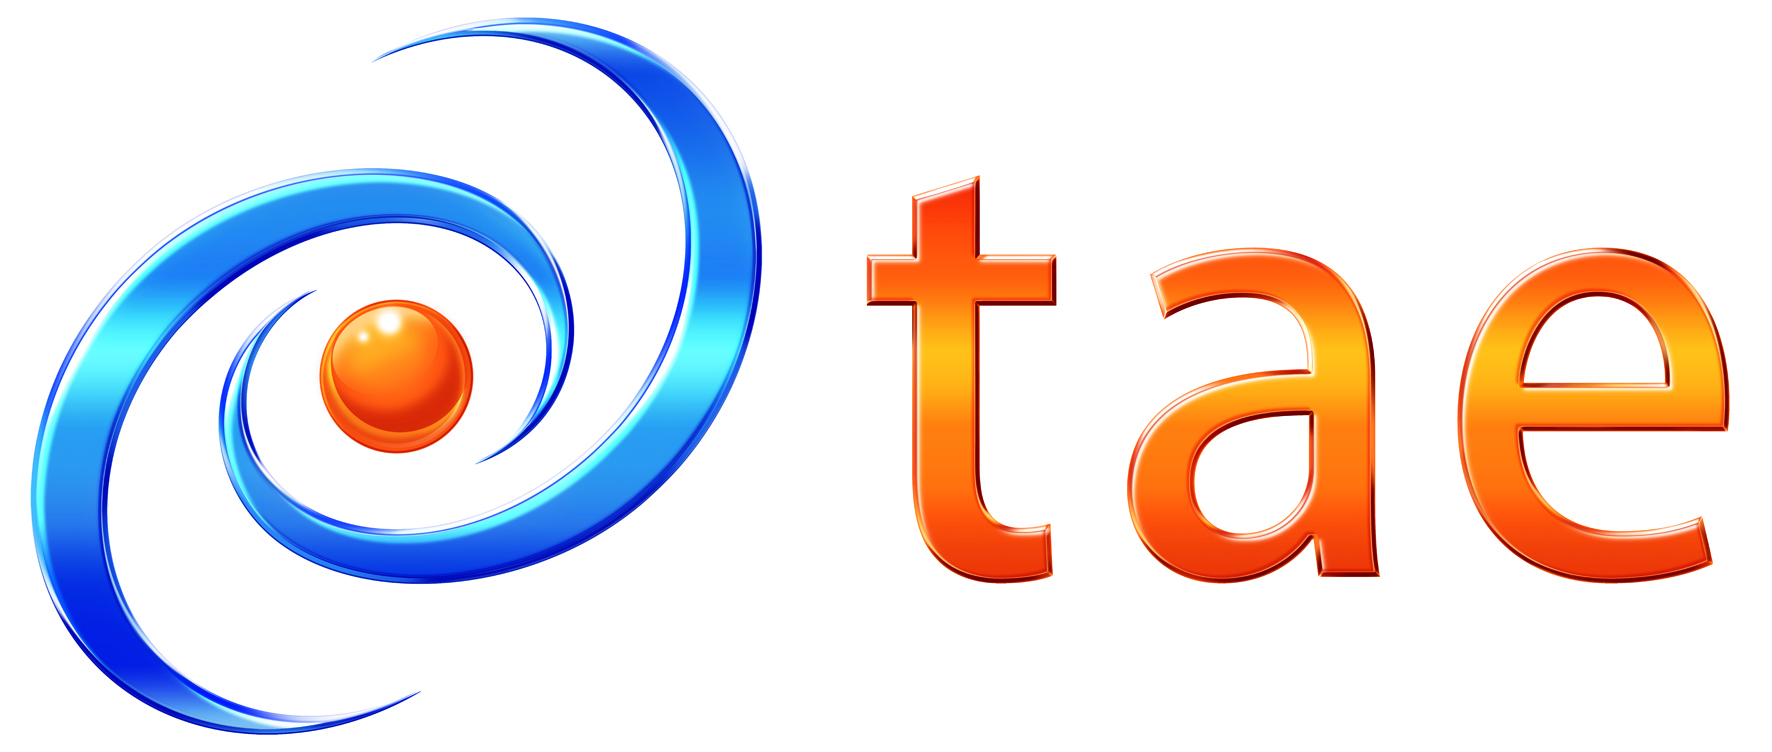 Nueva marca Tae transports